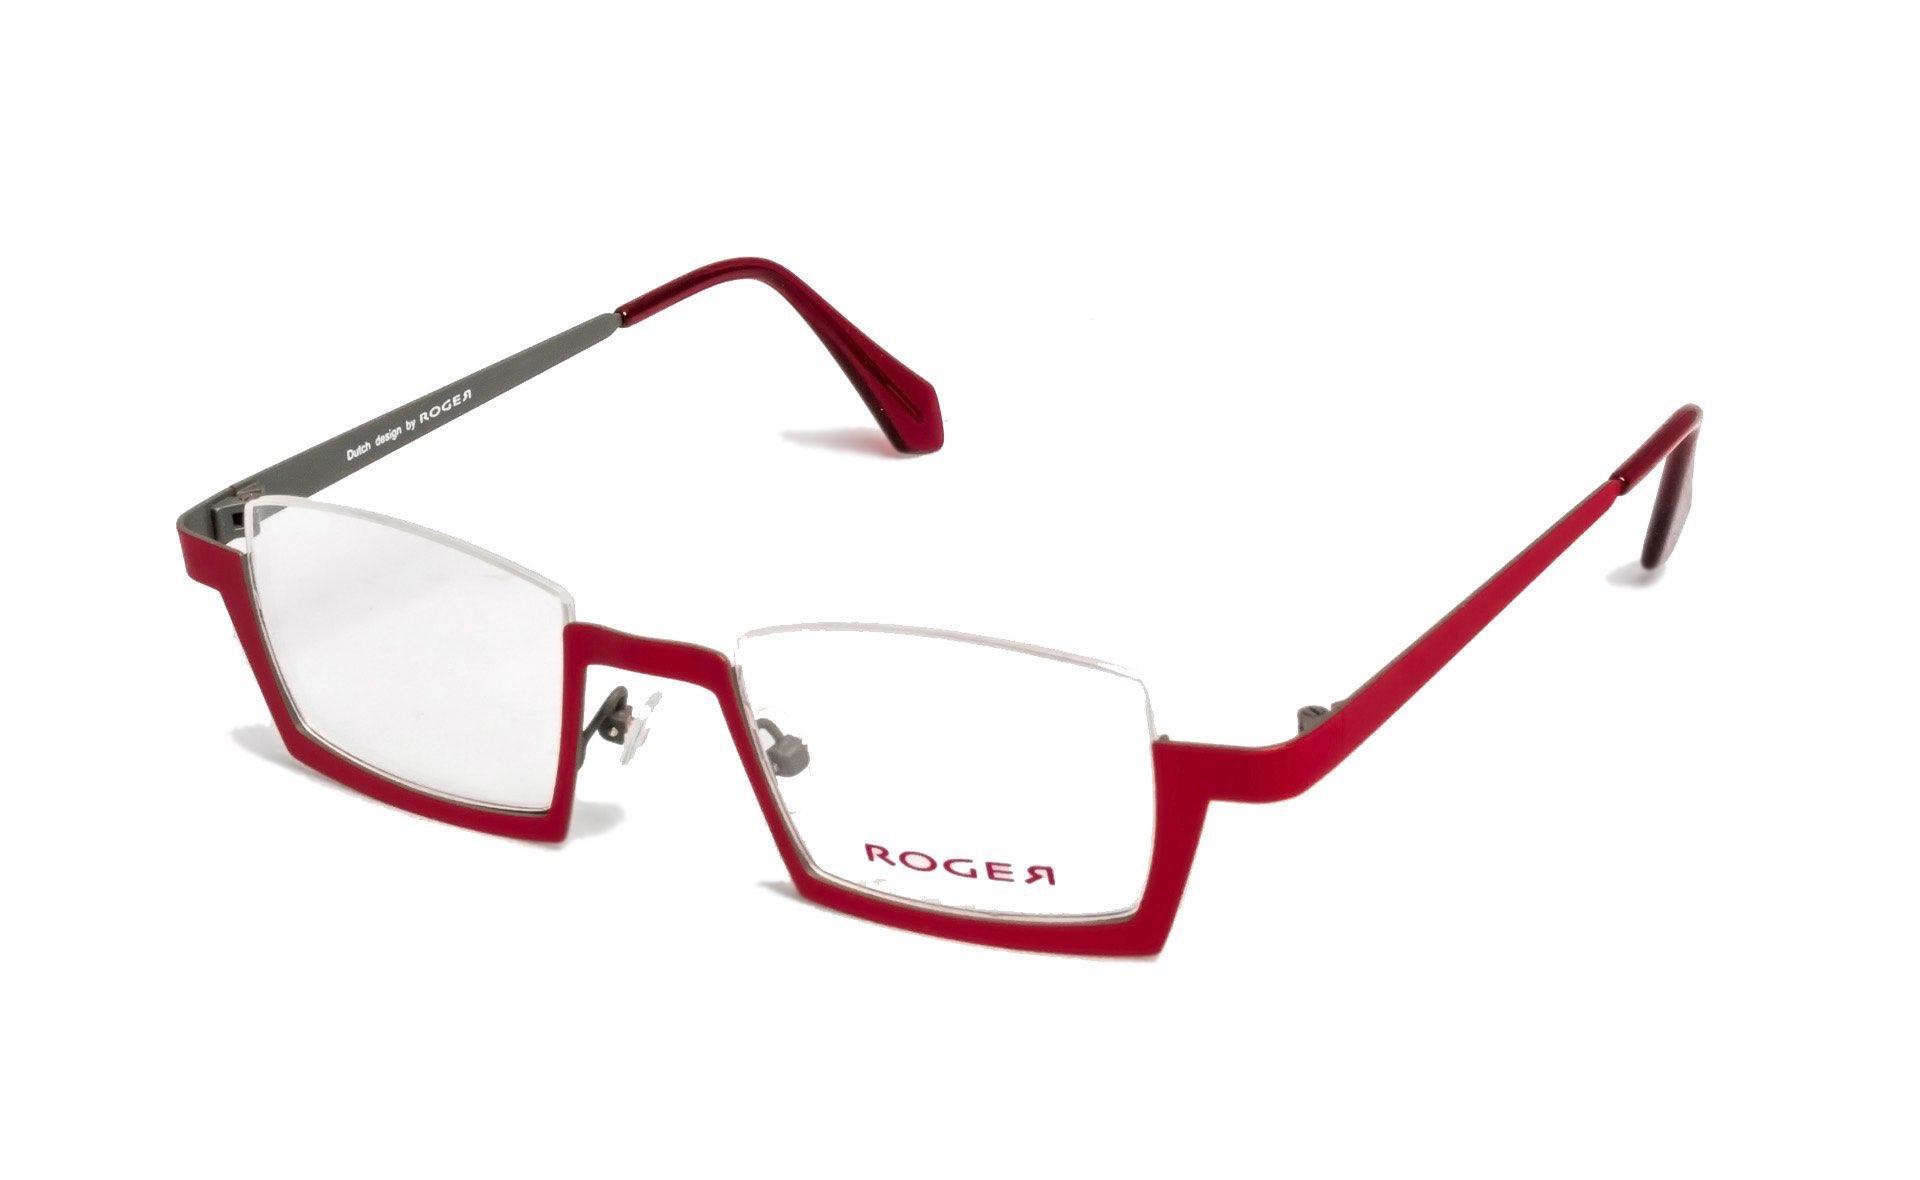 ROGER EYEWEAR design glasses boca raton | New Look Eye Wear